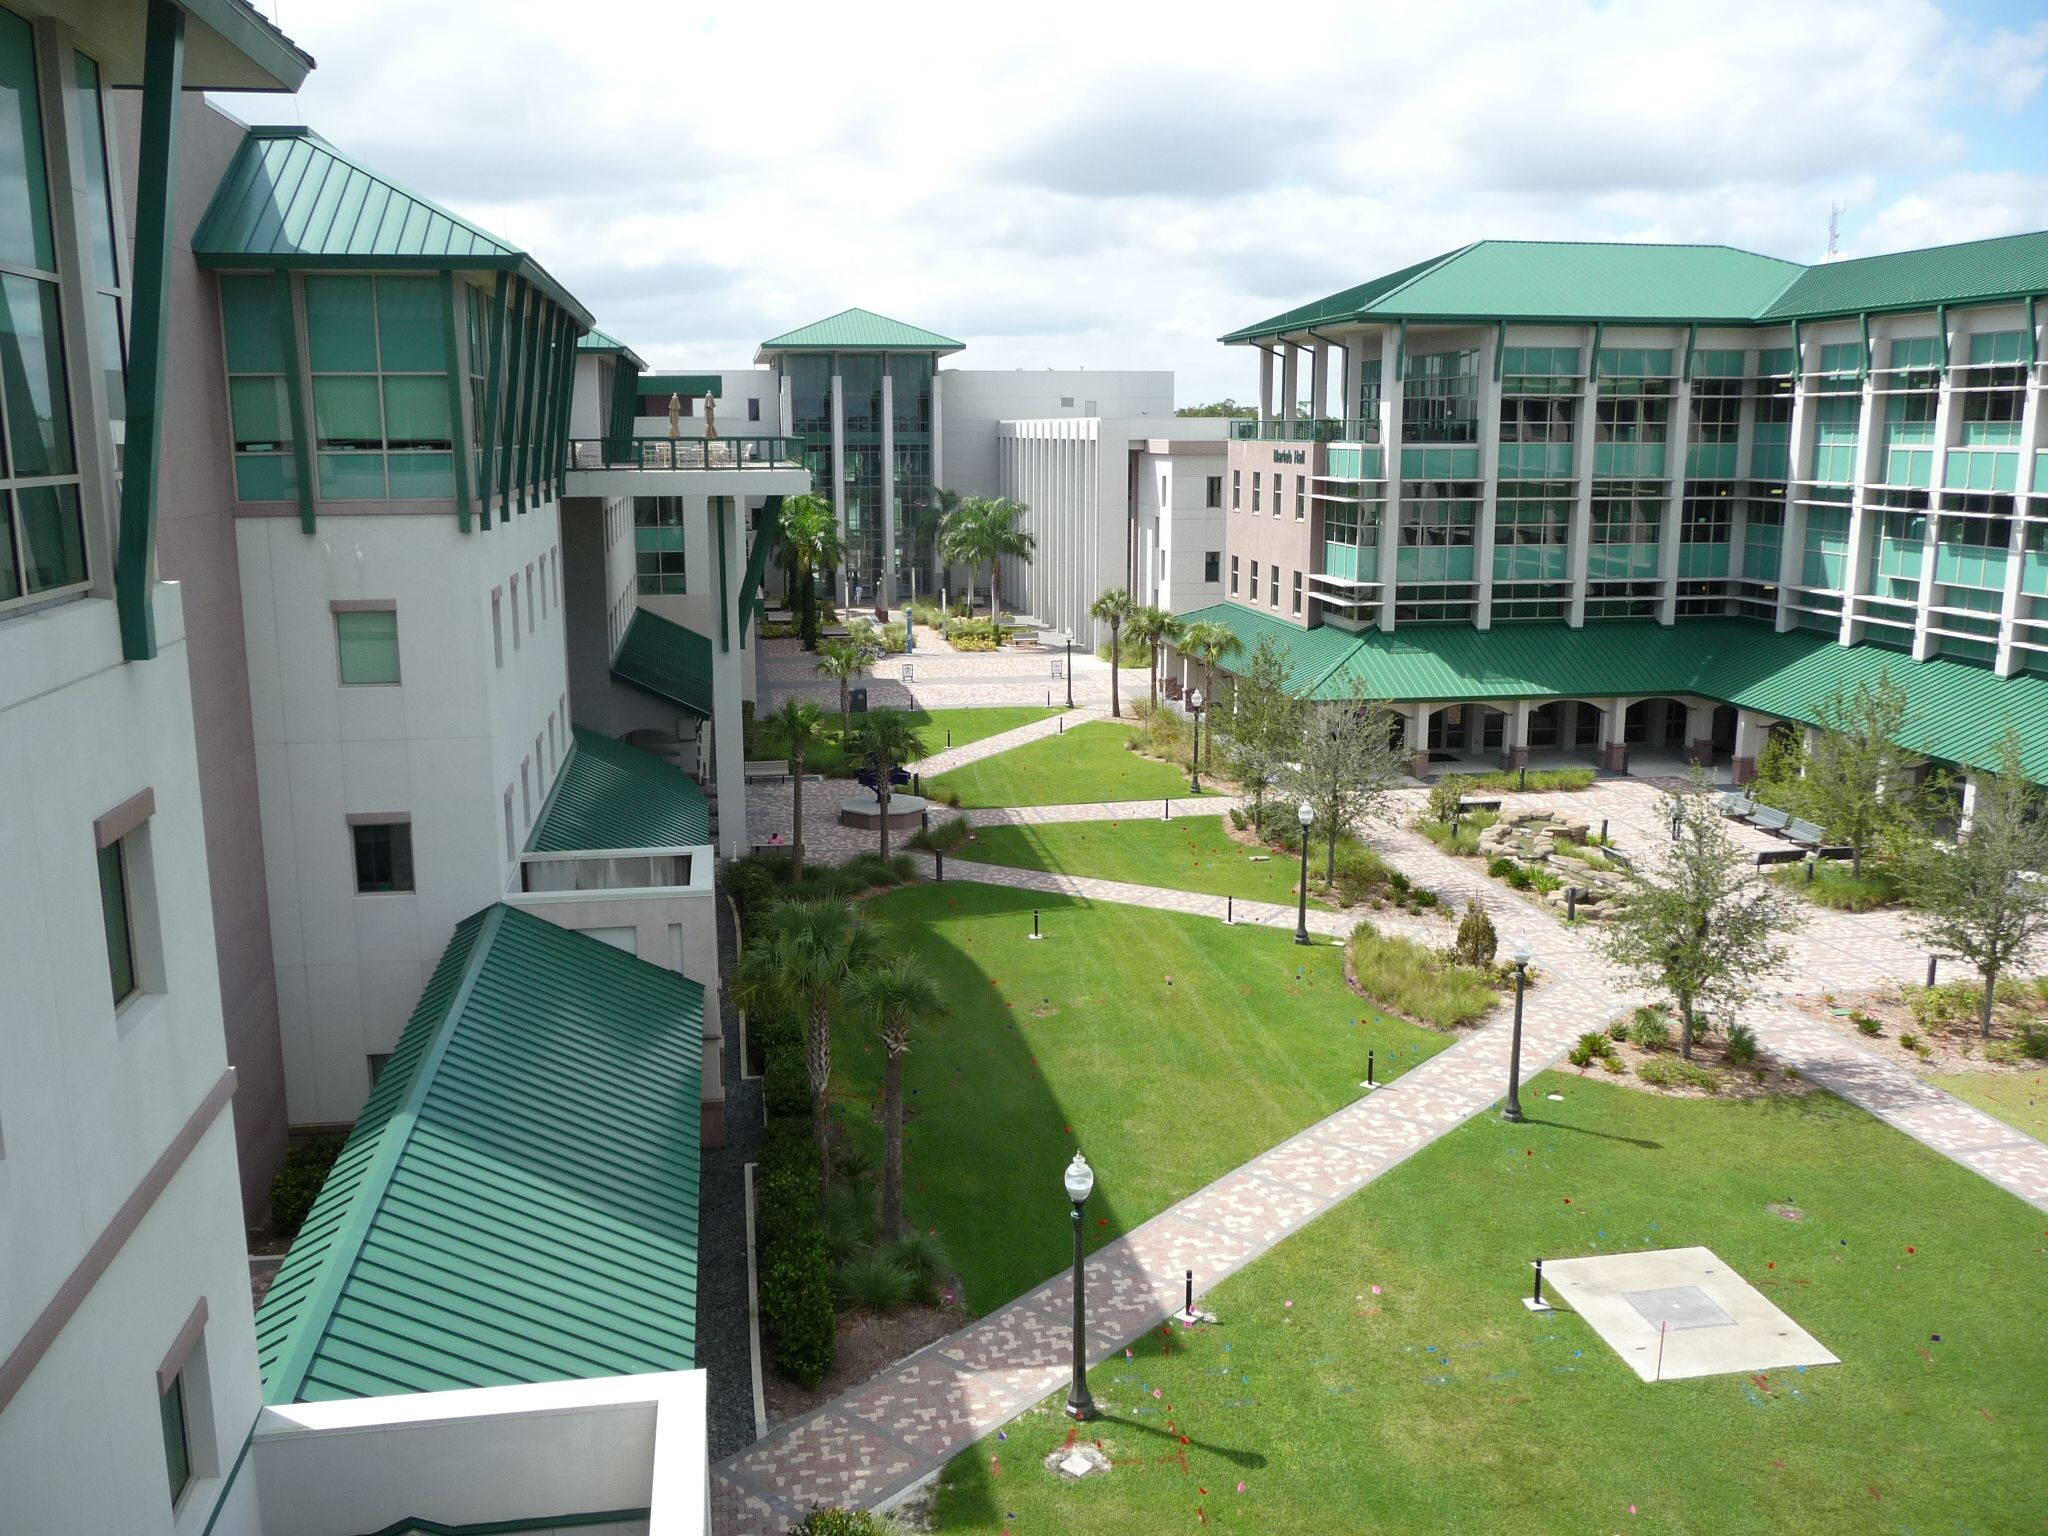 Bower School Of Music Florida Gulf Coast University Fort Myers FLPfeiffer Partners Architects